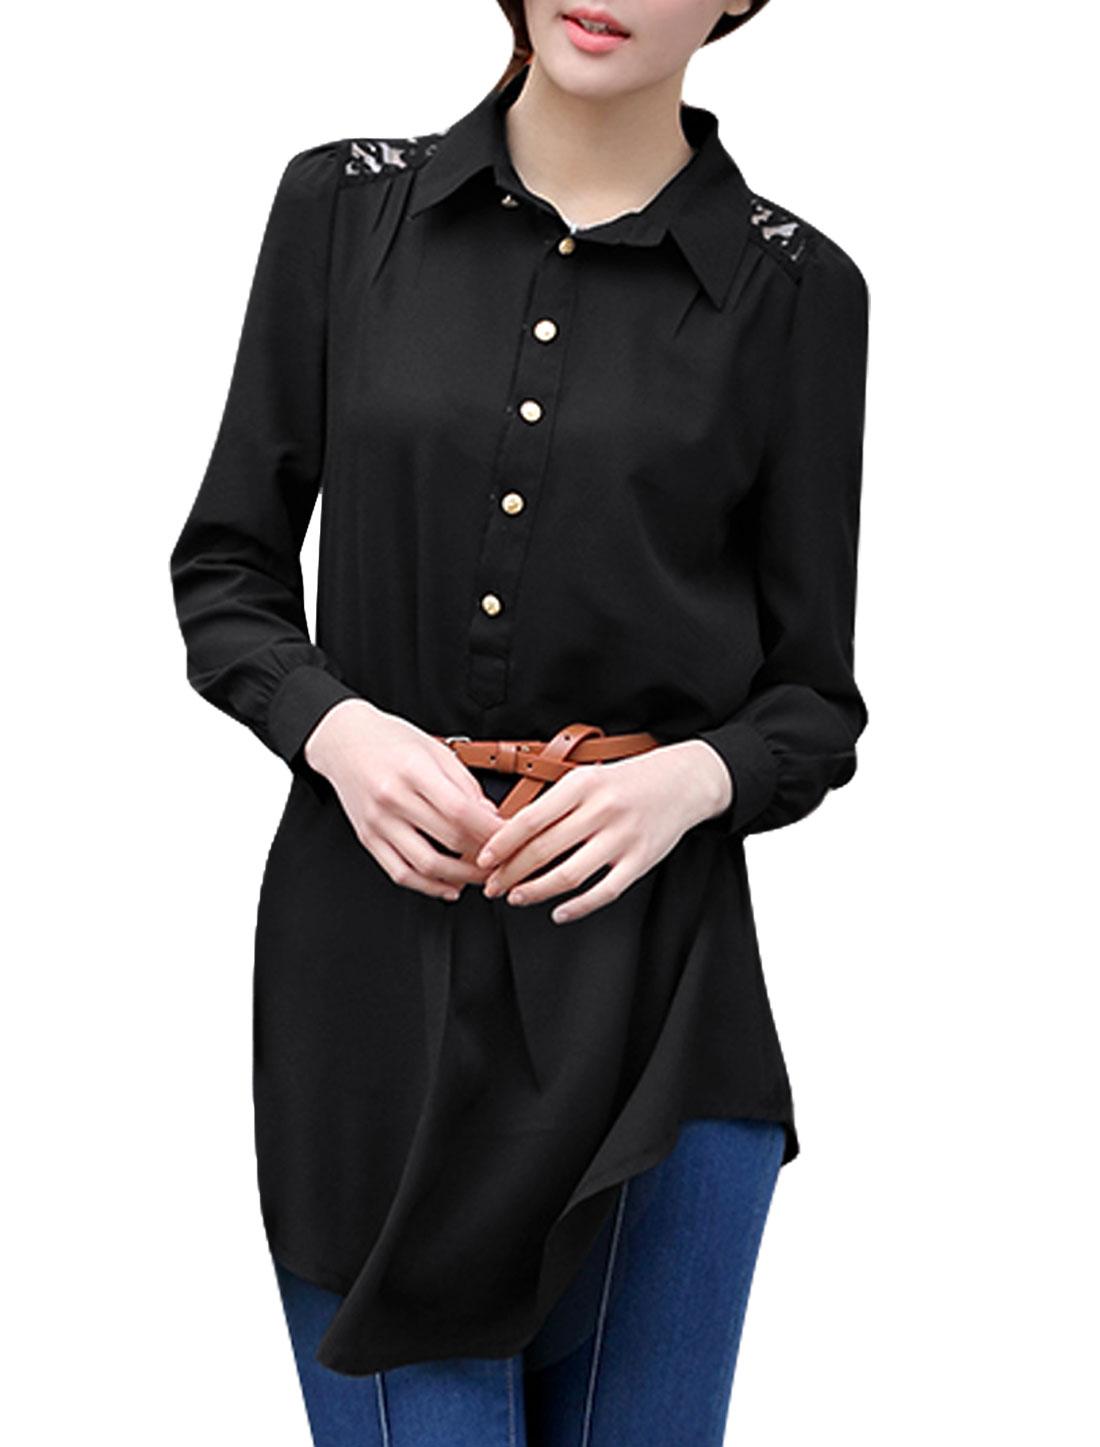 Woman Semi-Sheer 1/2 Placket Lace Spliced Back Shirt Dress w Belt Black L